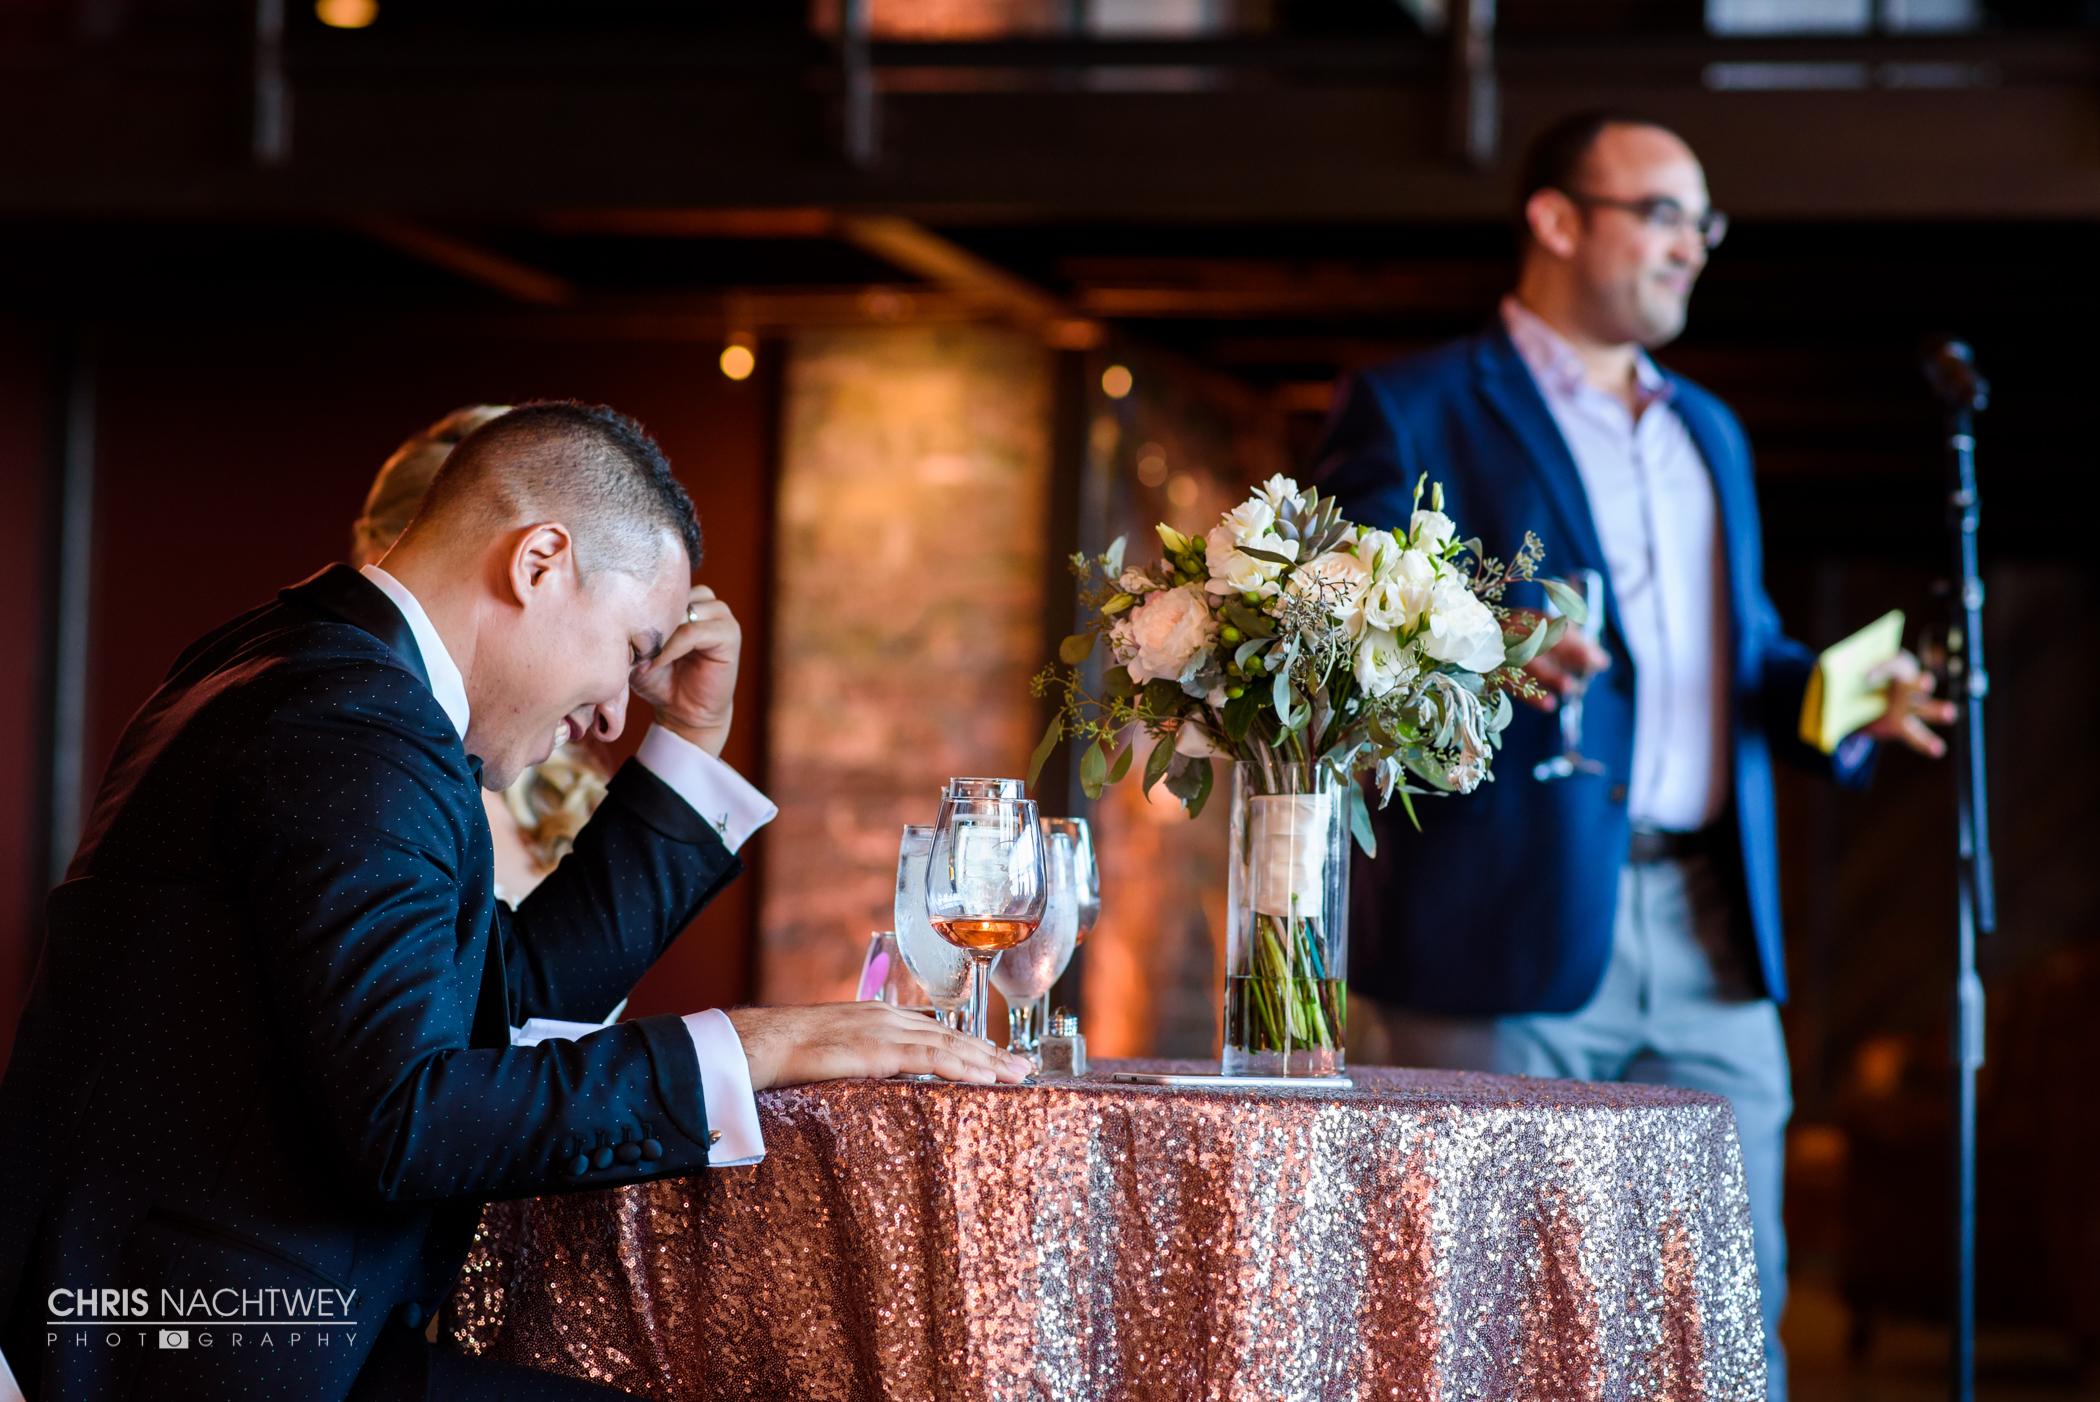 wedding-saltwater-farm-vineyard-photos-stonington-ct-chris-nachtwey-photography-2016-ana-austin-31.jpg